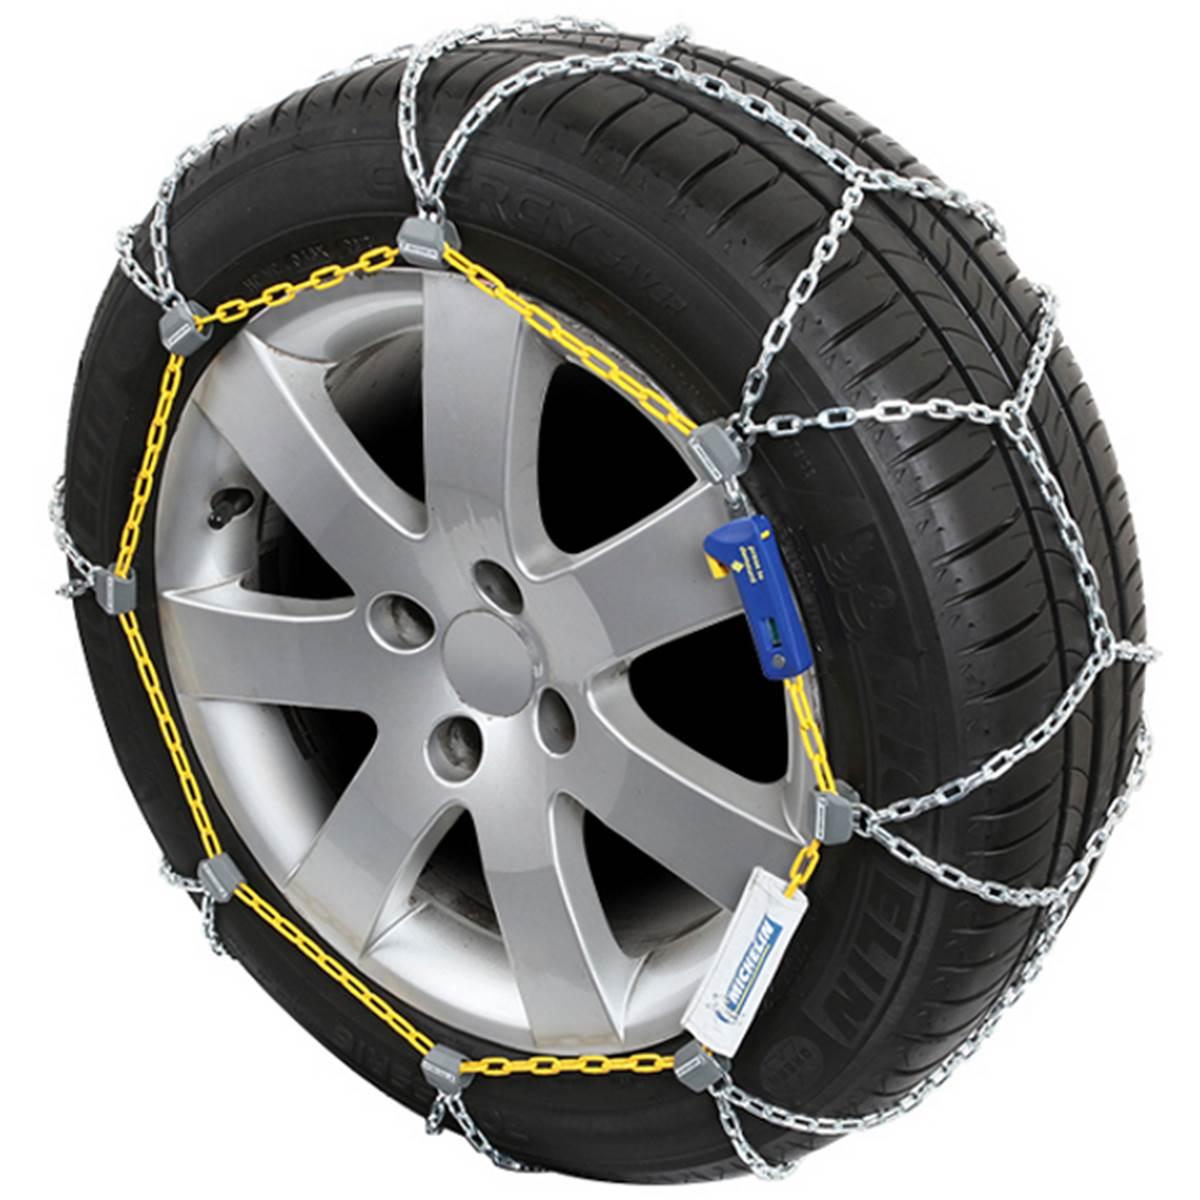 2 Chaînes neige Michelin elastic Chain MI50